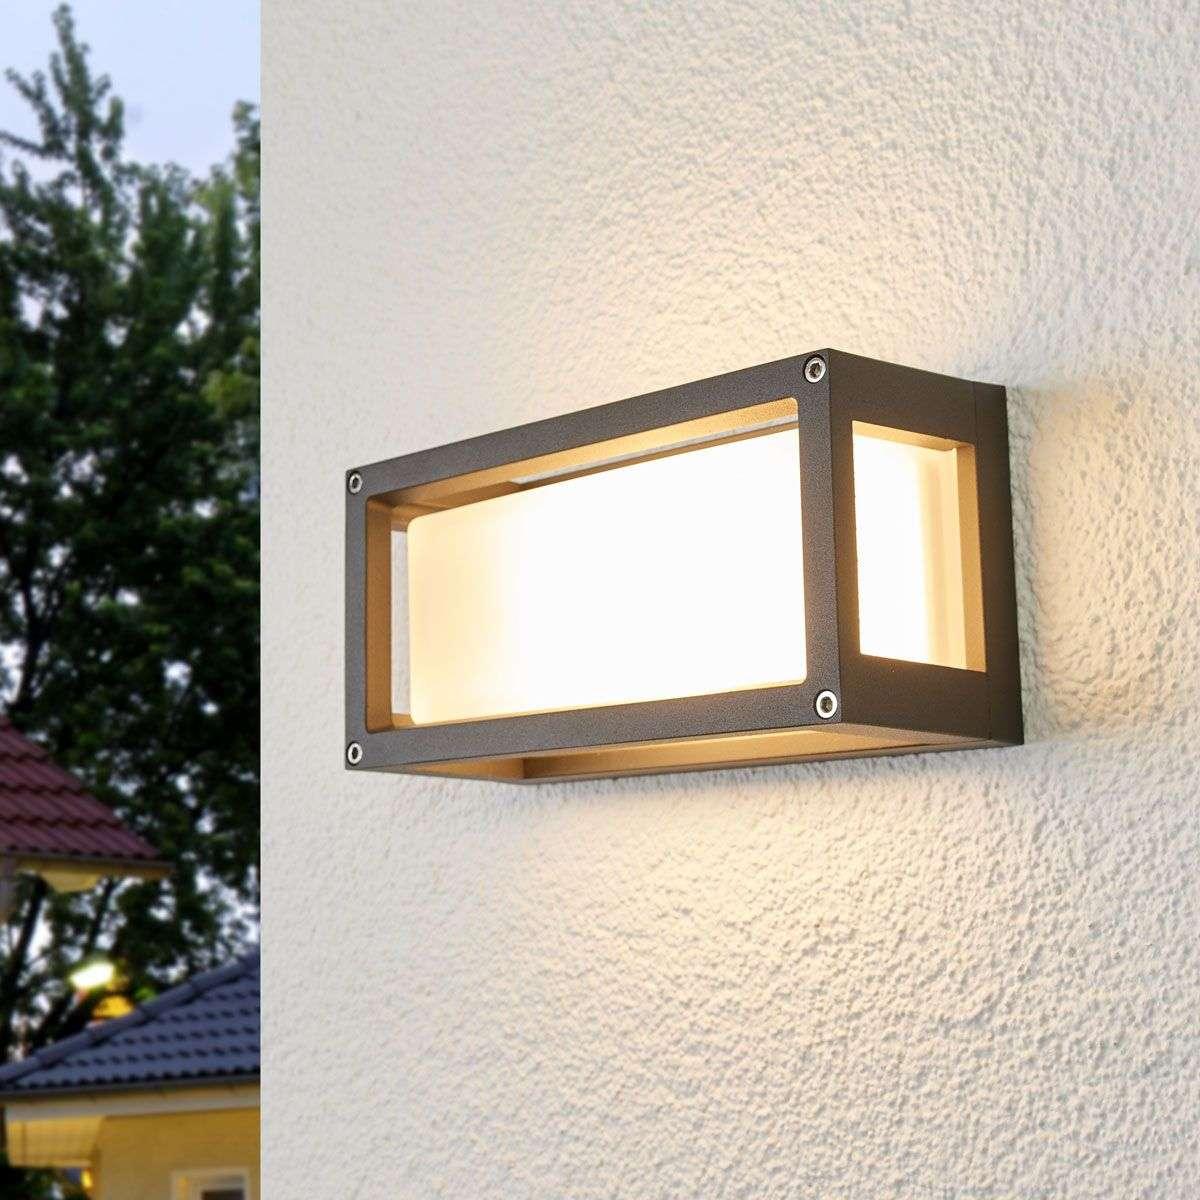 Aurelien - outdoor wall light with grey frame | Lights.ie